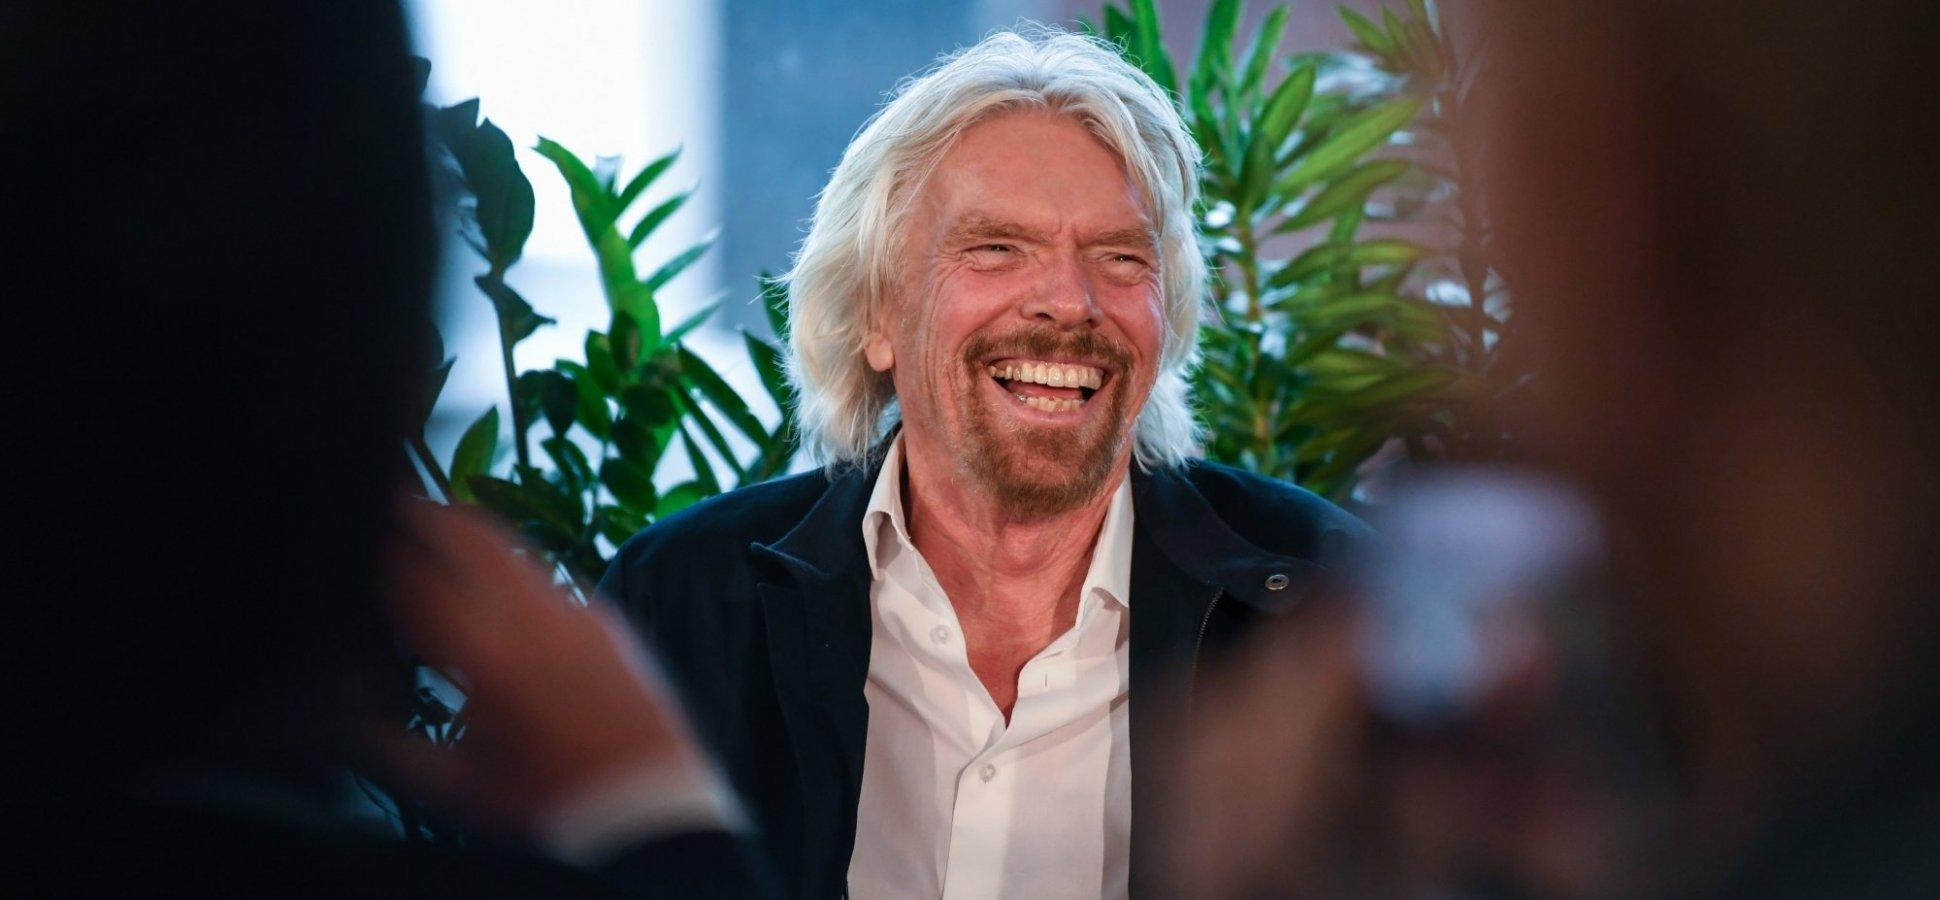 Why Richard Branson Wants Elon Musk to Get Some Sleep